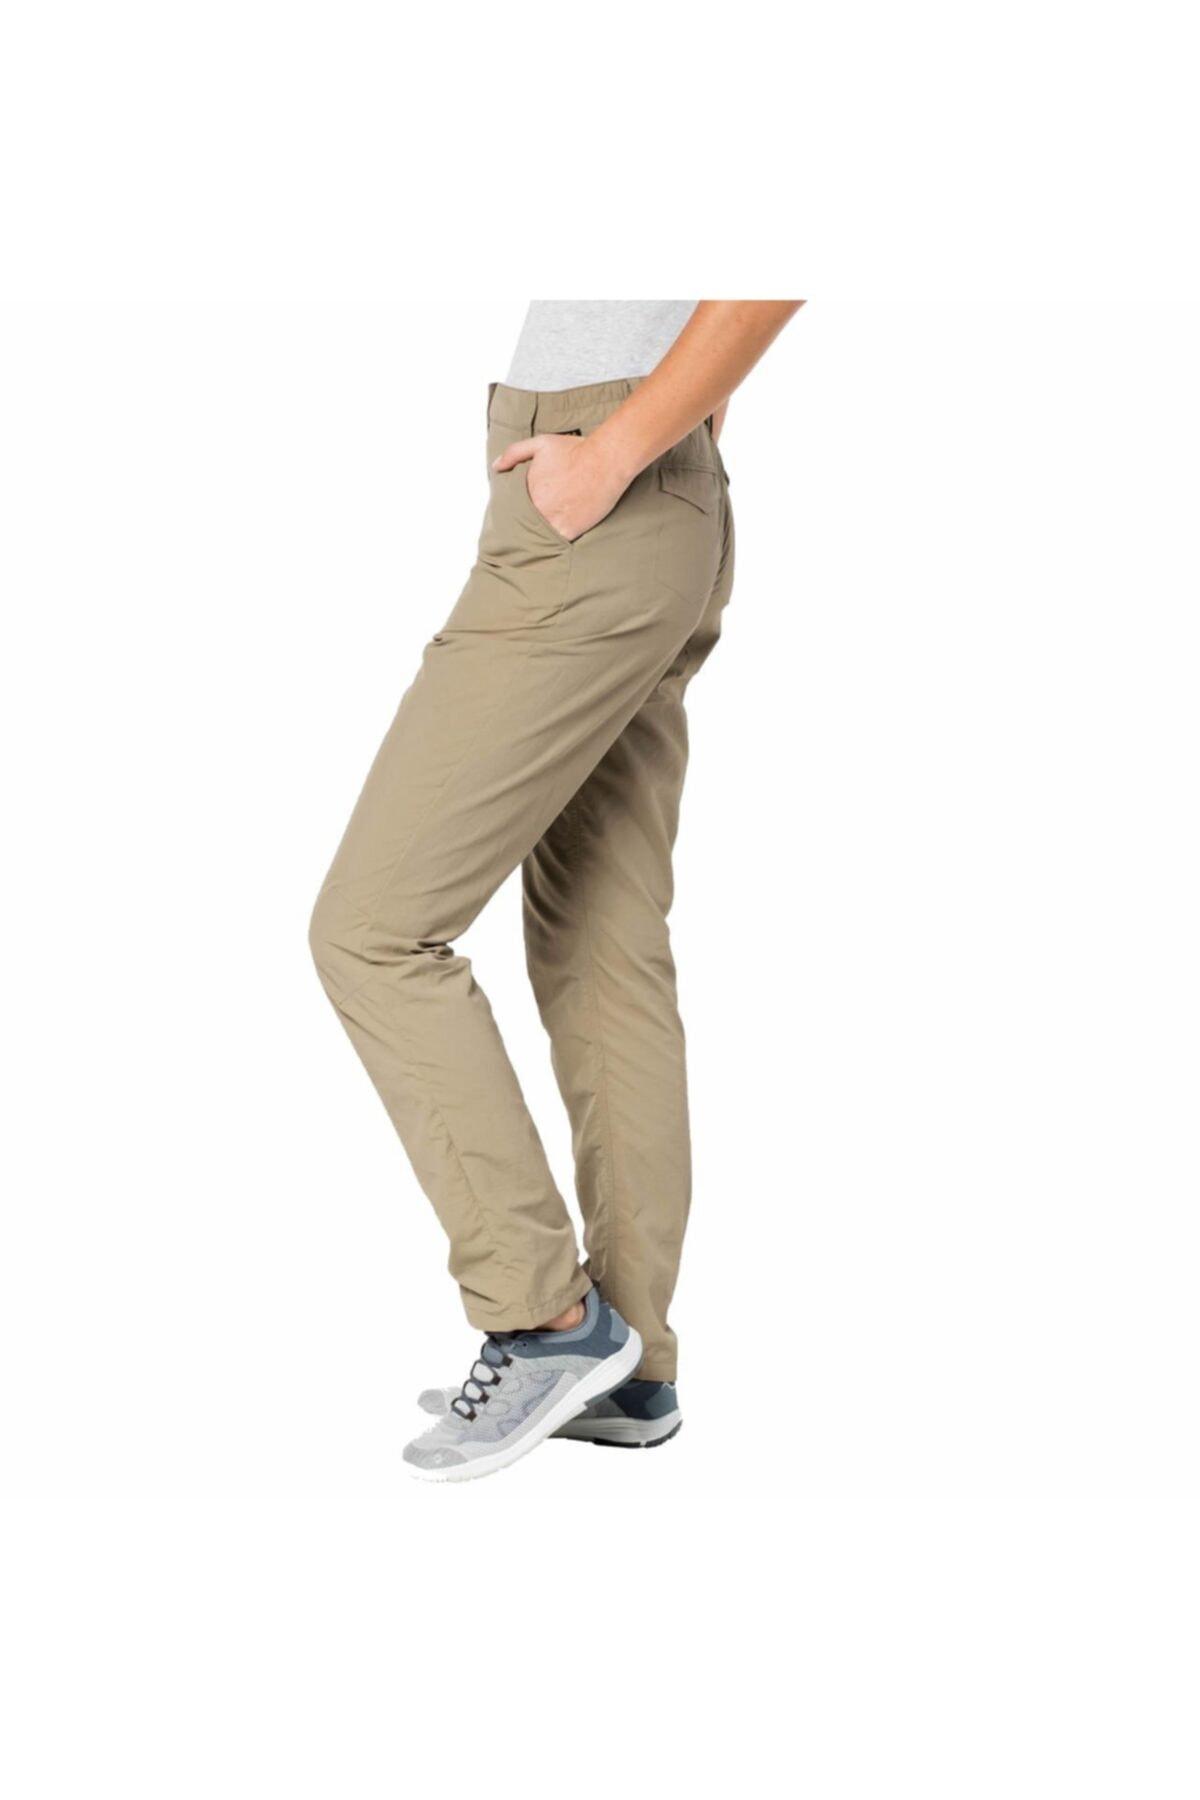 Jack Wolfskin Kalahari Kadın Pantolon 2